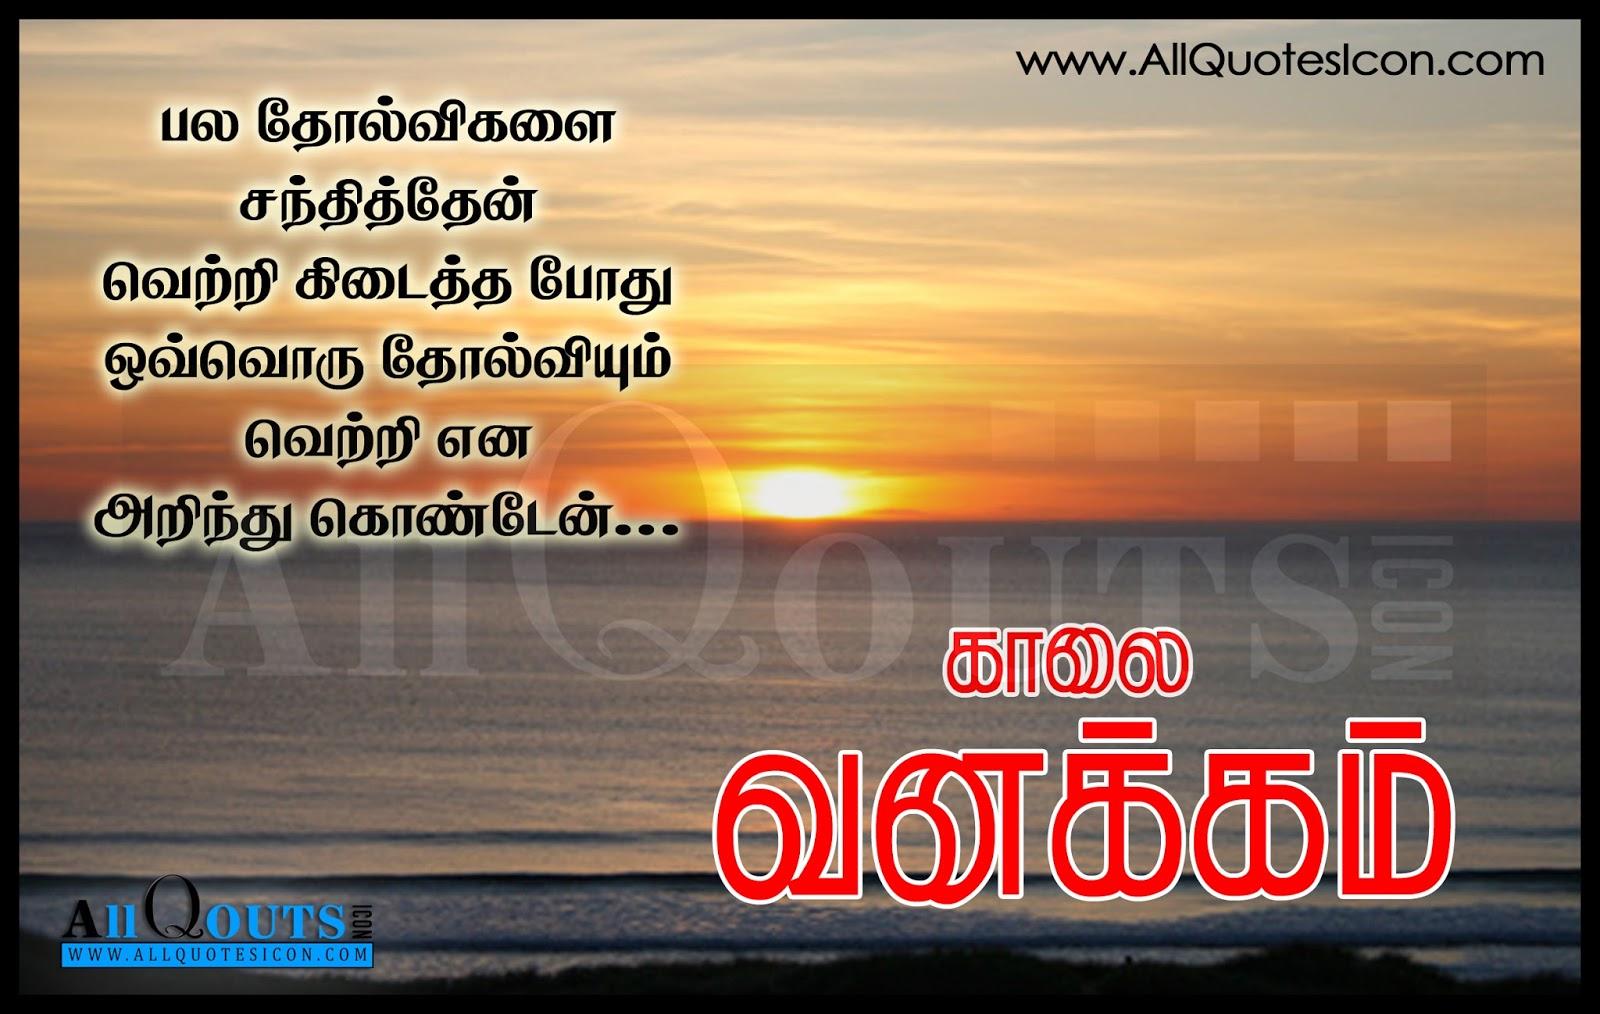 Good Morning Beautiful Kavithai : Tamil quotes good morning wishes pictures beautiful